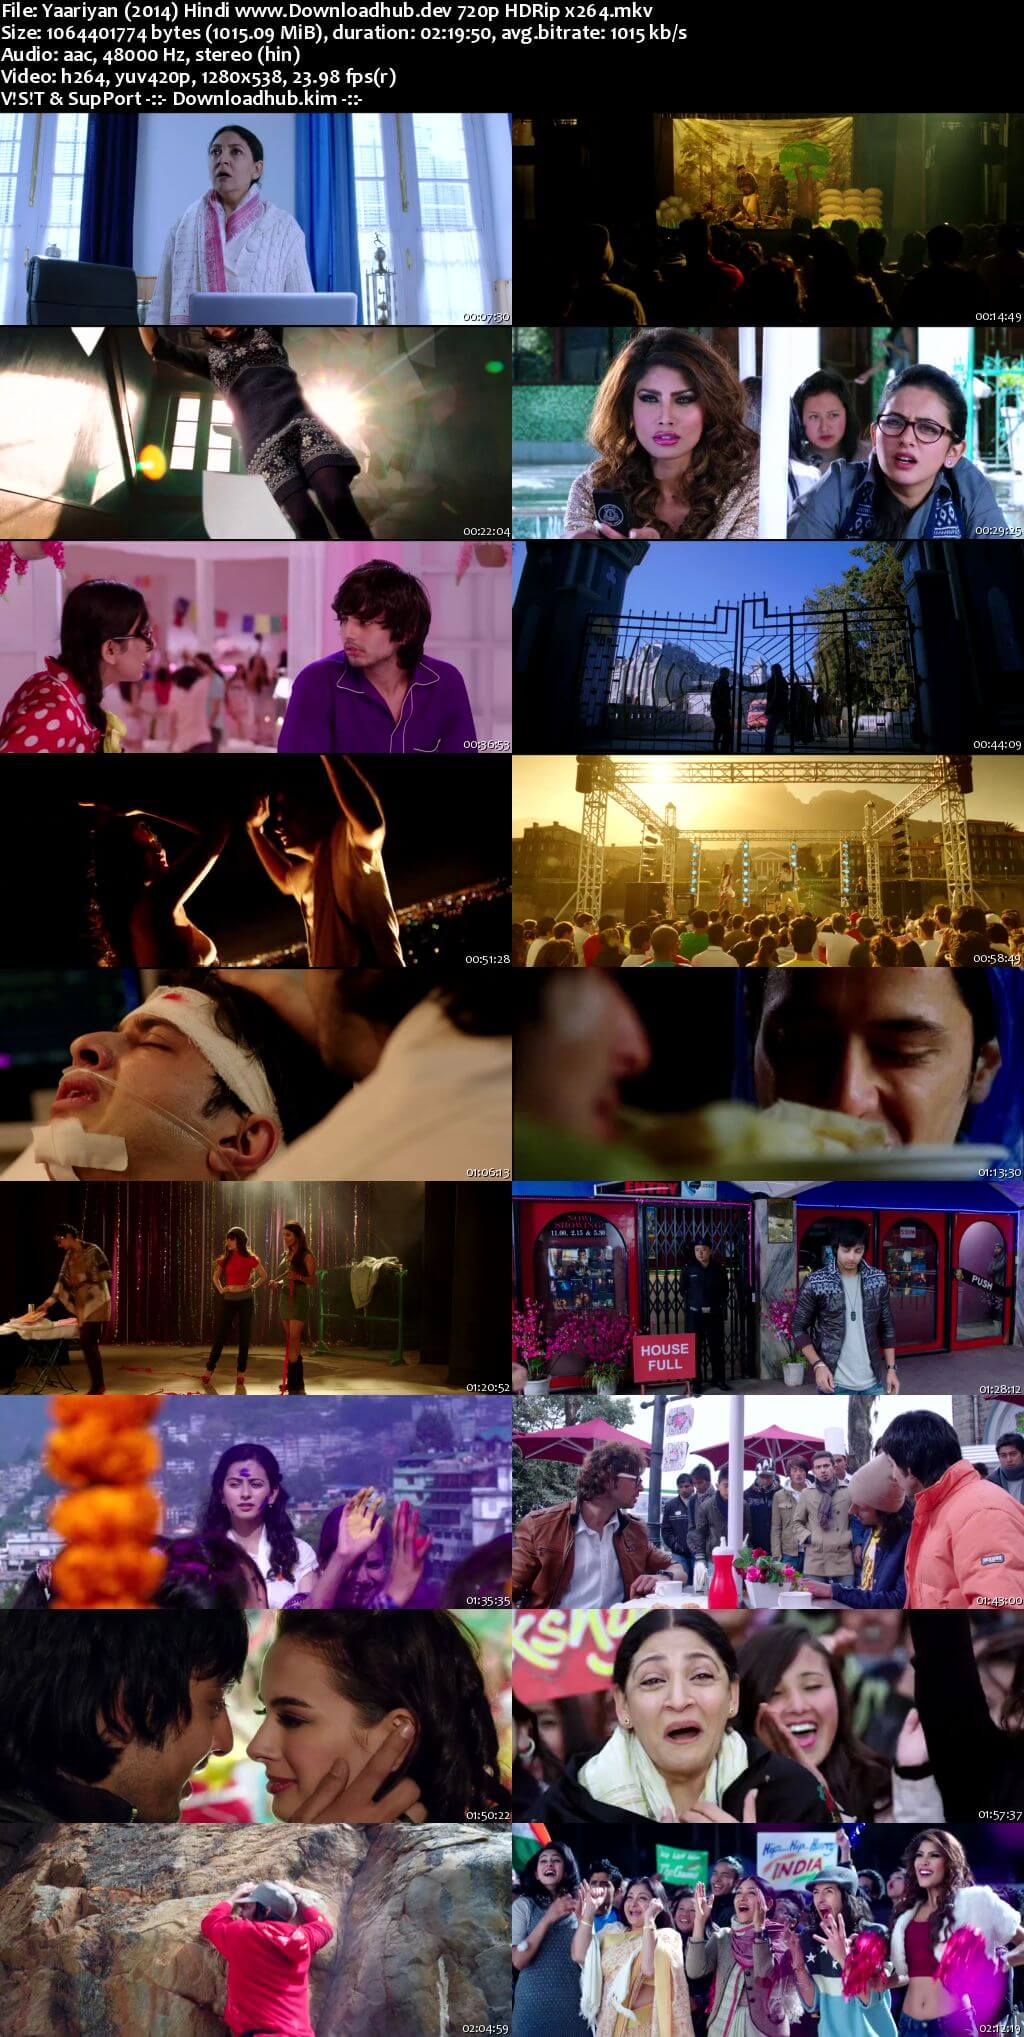 Yaariyan 2014 Hindi 720p HDRip x264